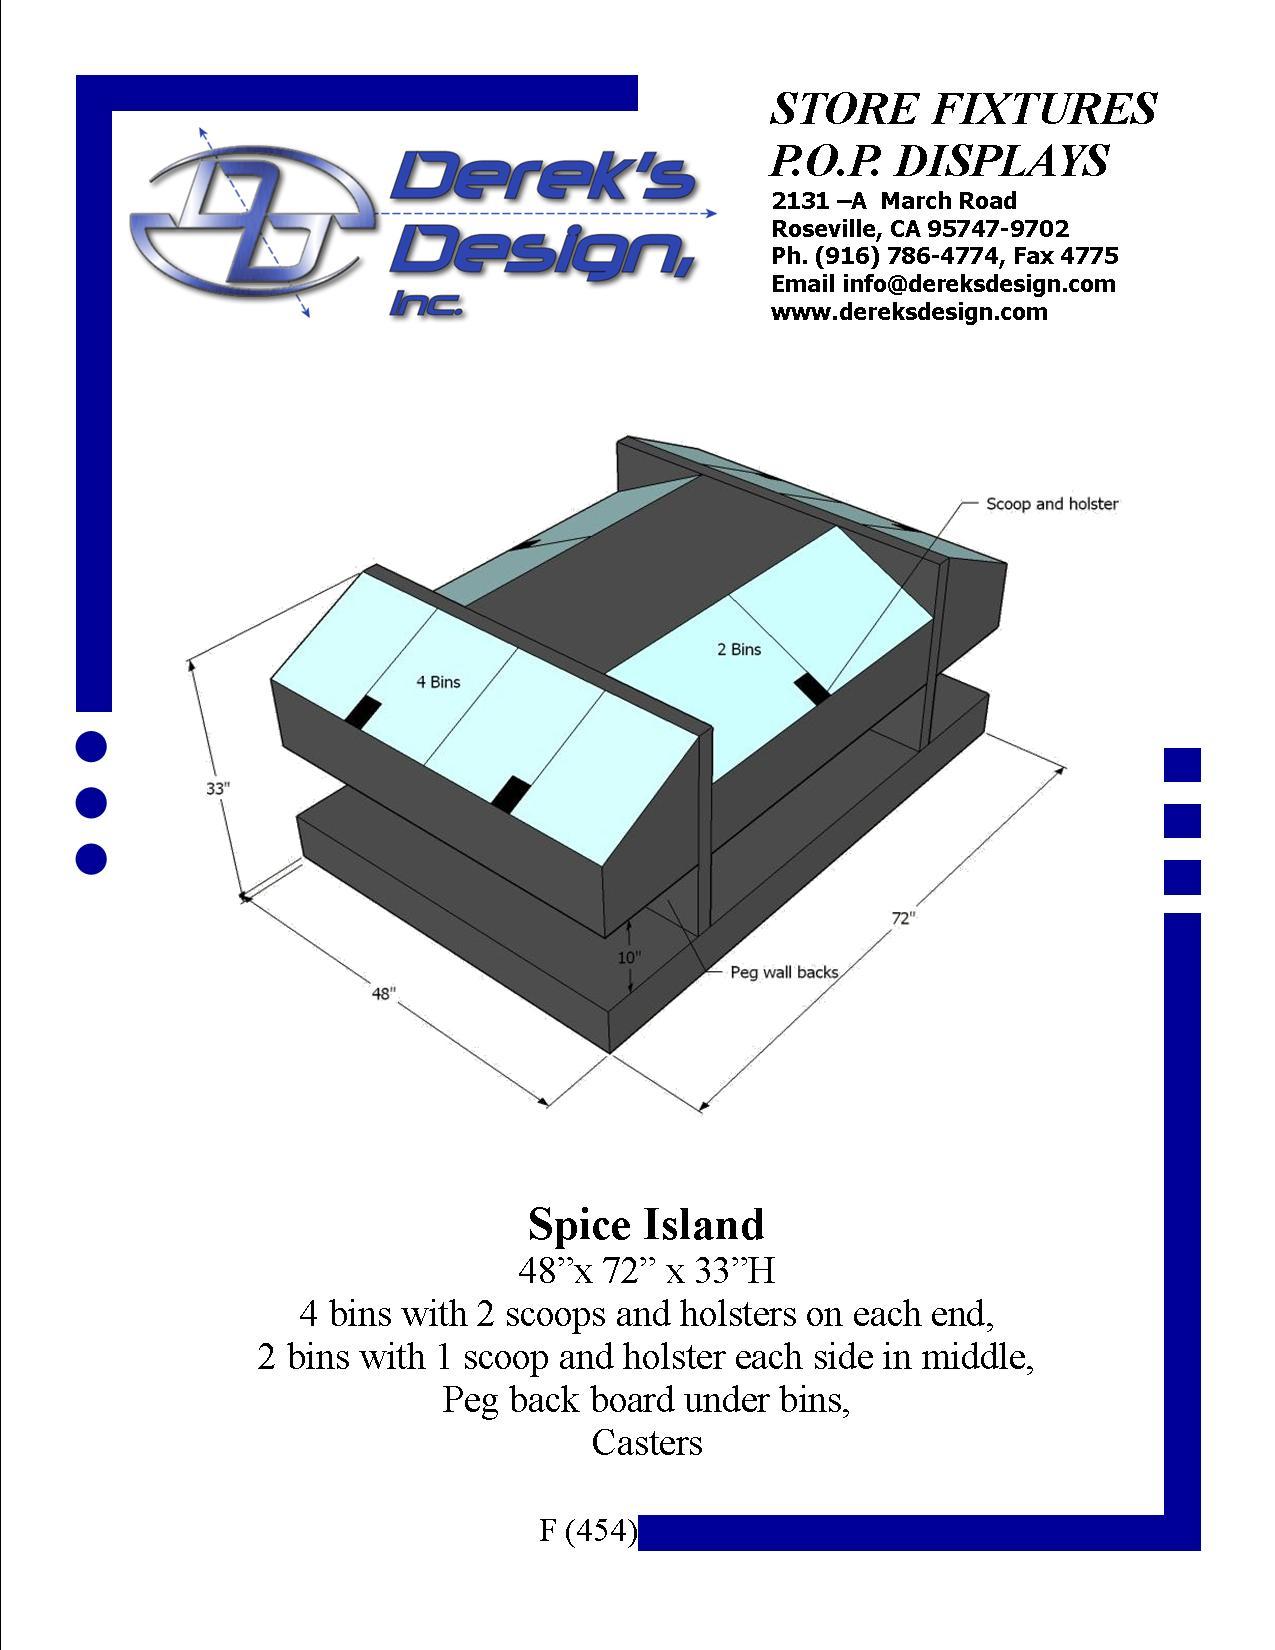 "<A HREF=""MAILTO:ORDERS@DEREKSDESIGN.COM?SUBJECT=F%20(454)&BODY=http://www.dereksdesign.com/gallery/custom-displays/f-454/"">CLICK HERE FOR INQUIRY </A>"